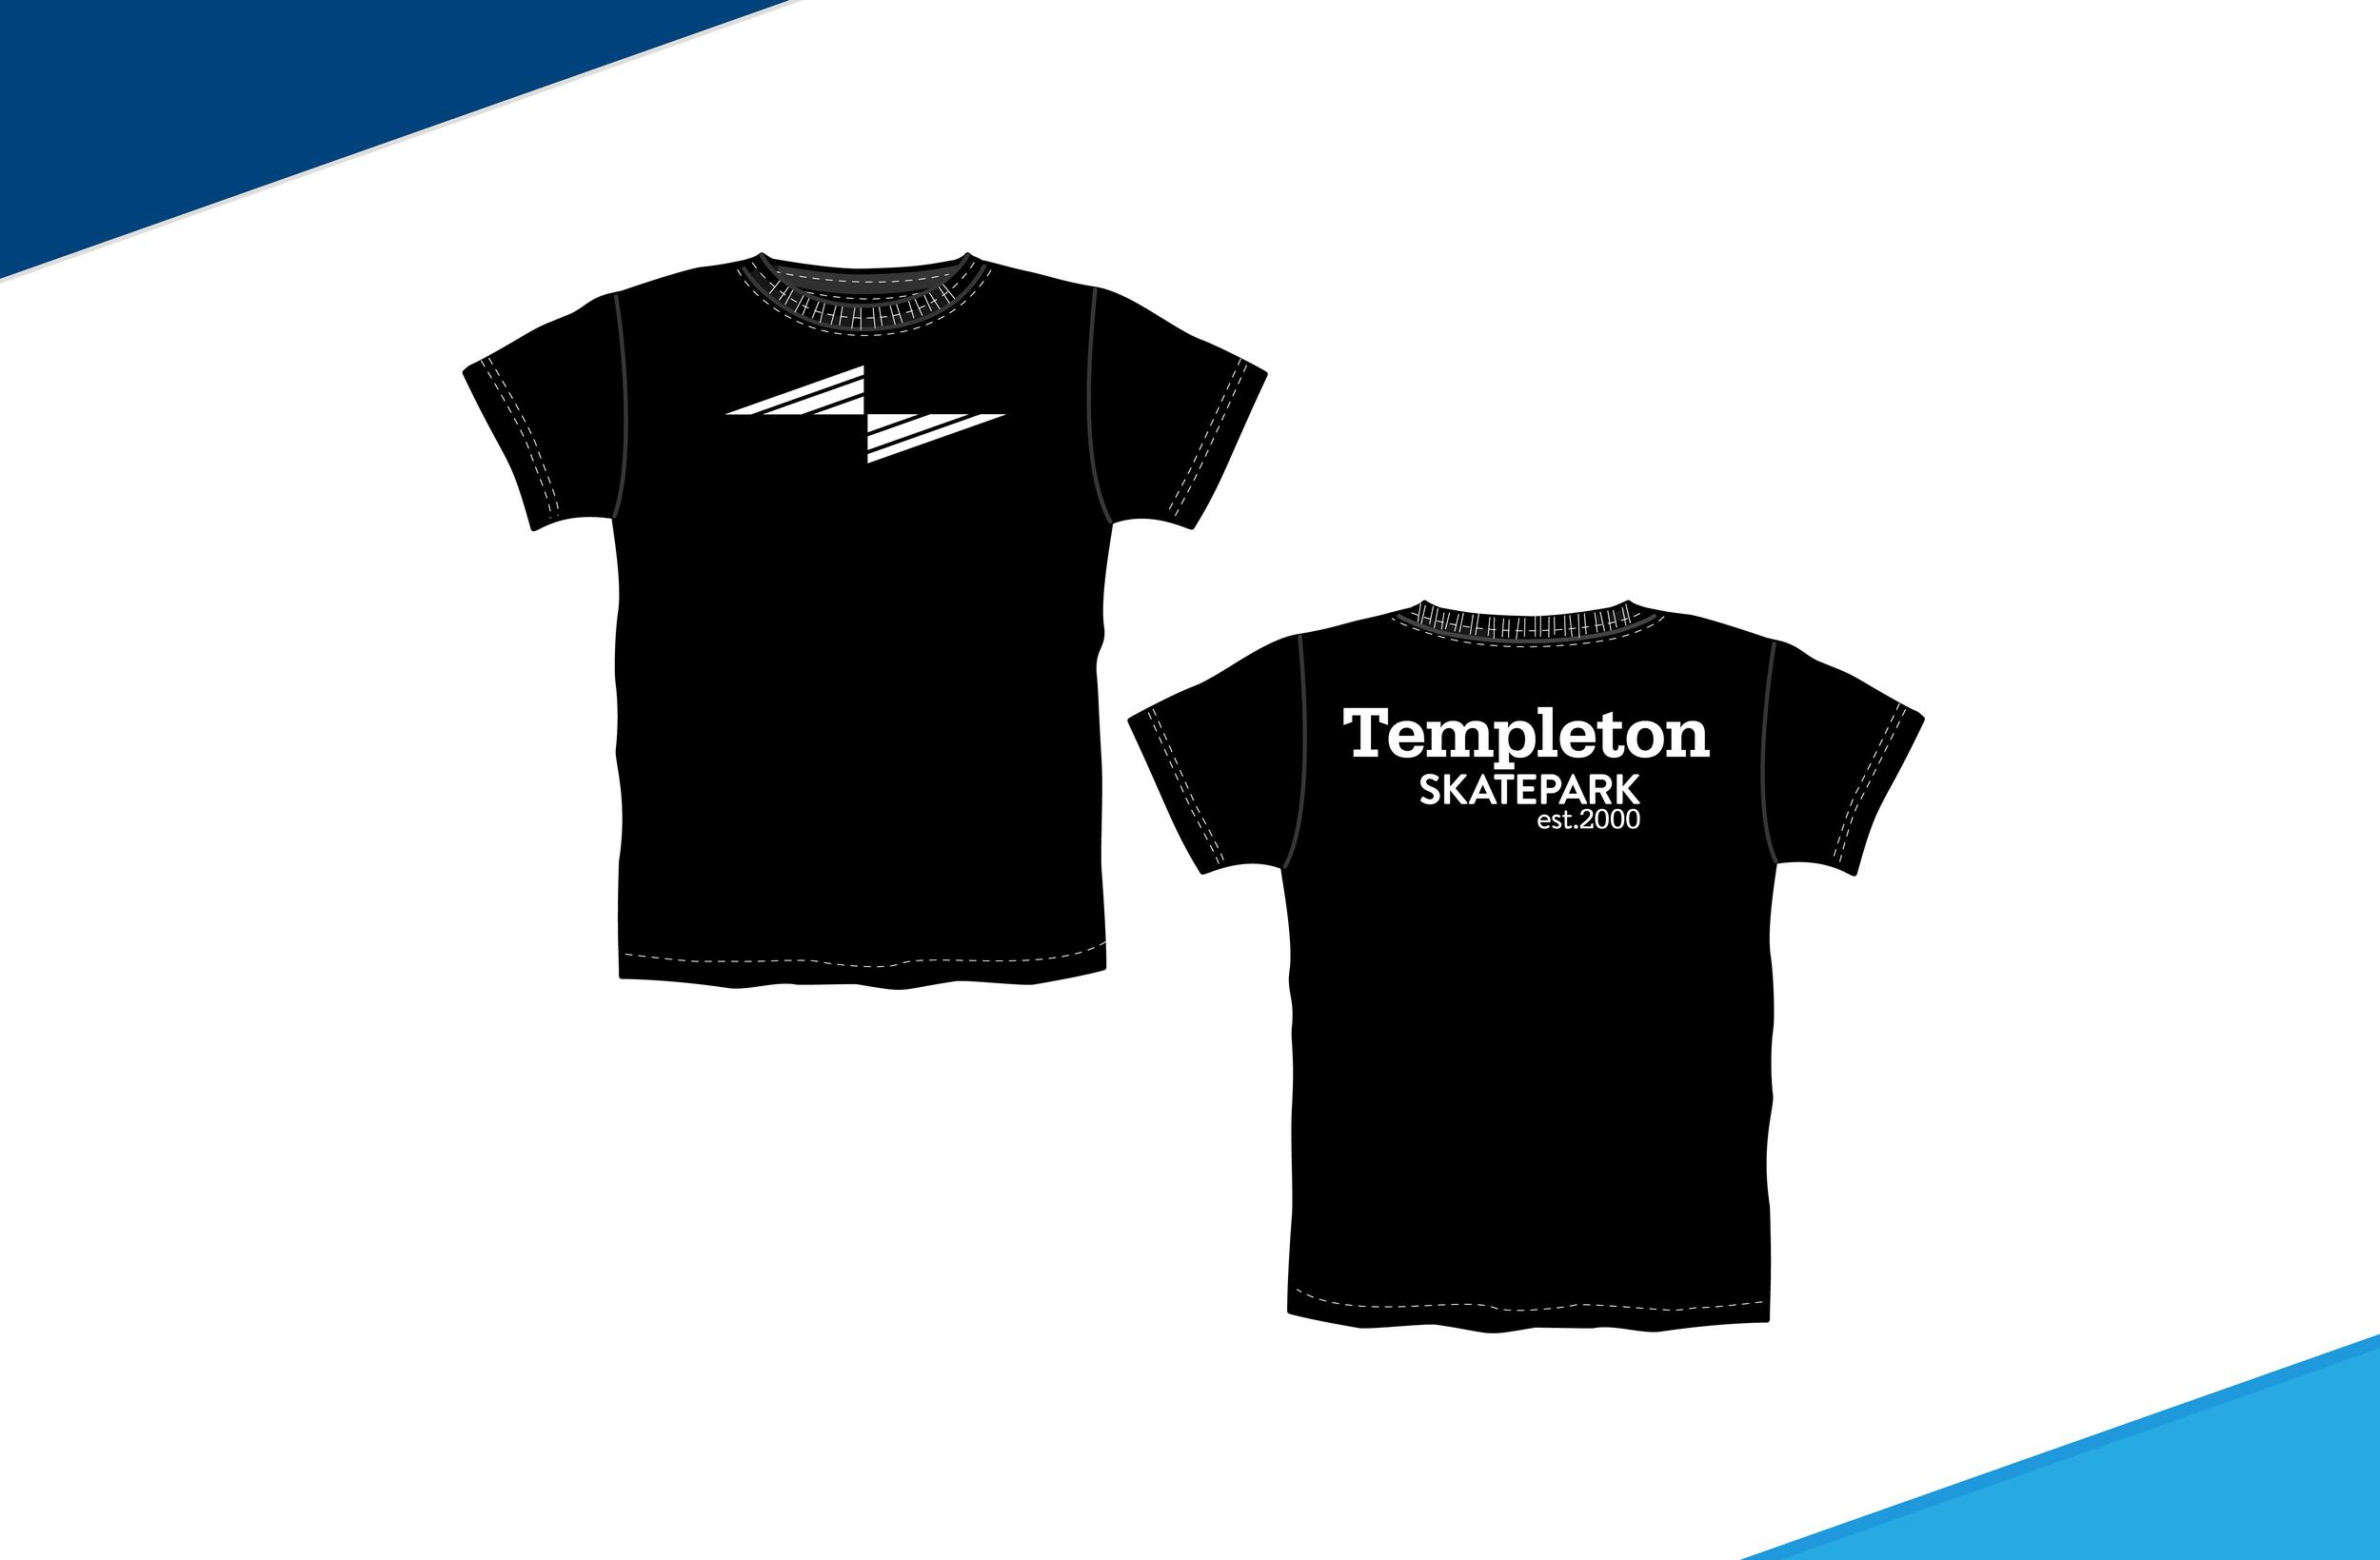 Templeton skatepark apparel web6.jpg